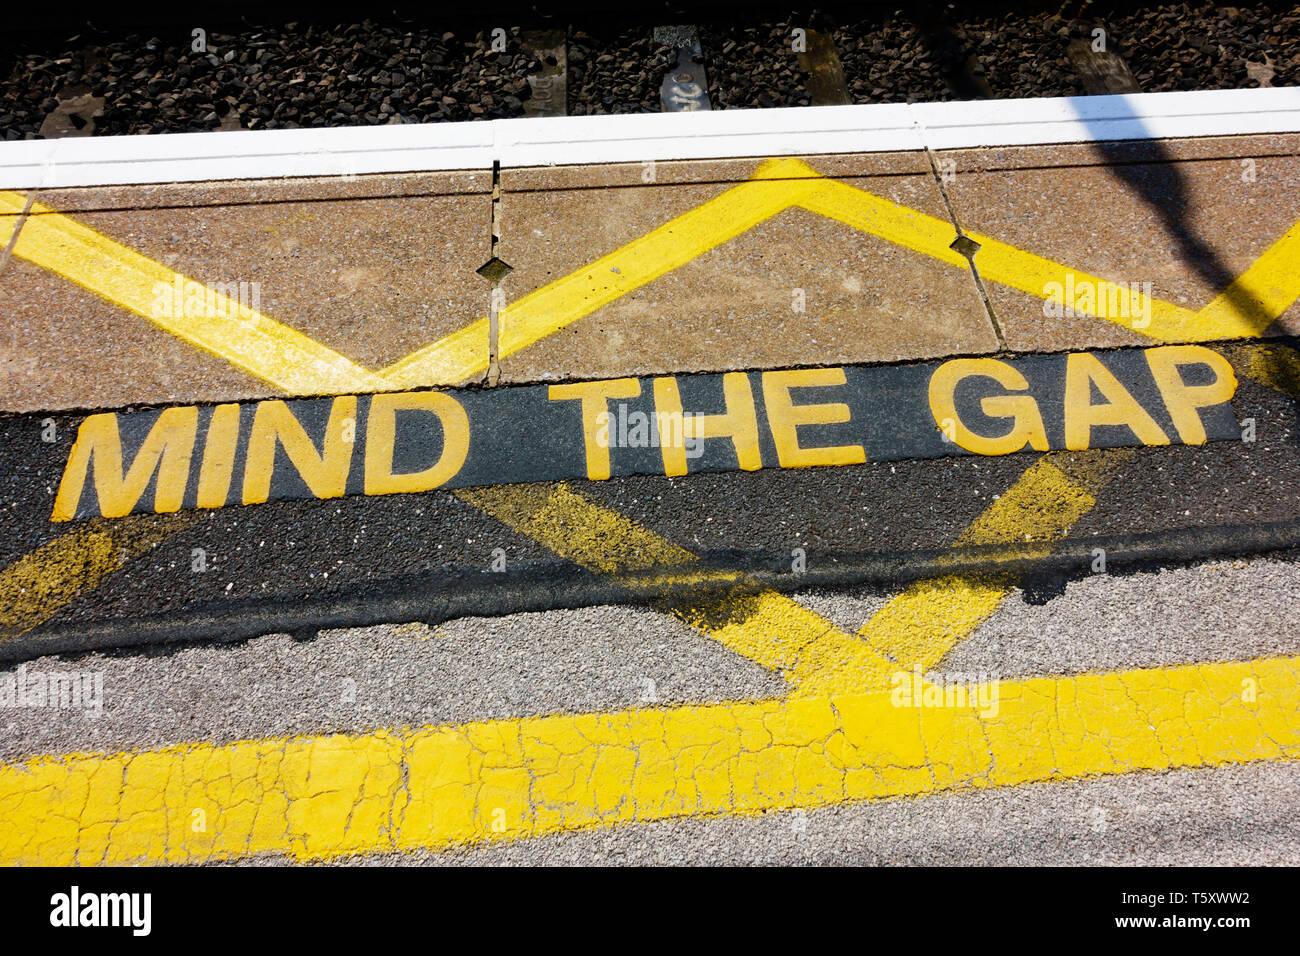 'Mind the gap' warning sign on the railway platform edge. - Stock Image